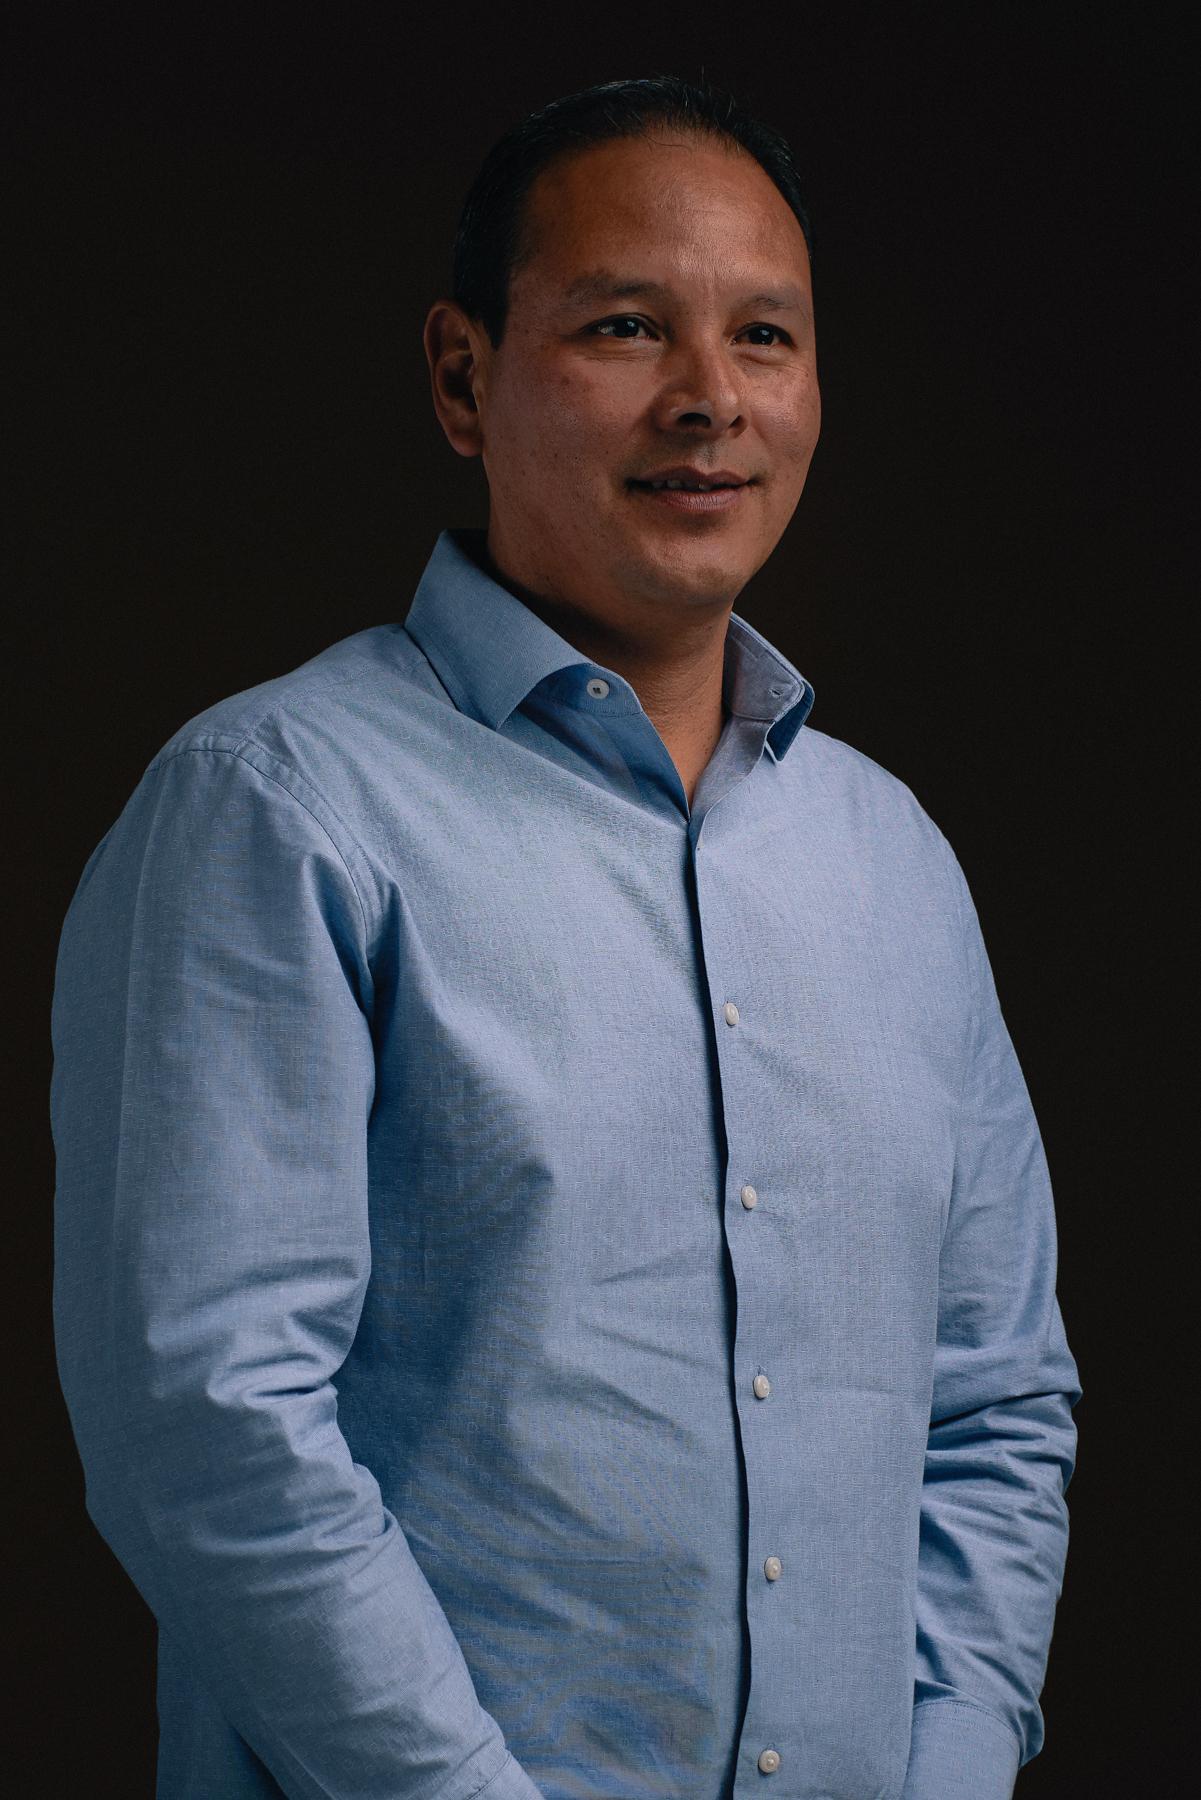 Ruben Servin - Project Superintendent | rservin@cltvt.com | 619.623.6220